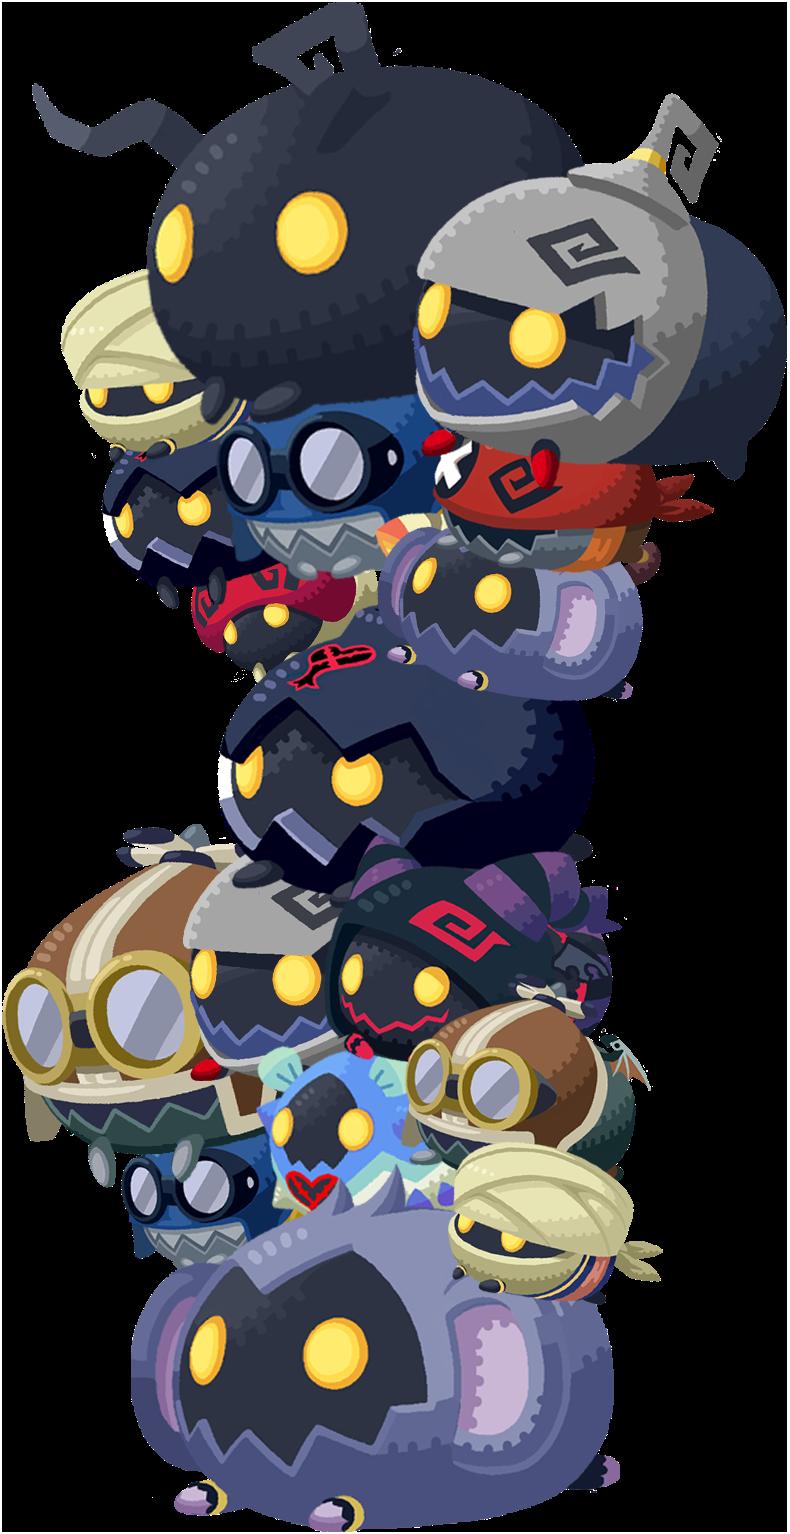 Image Kingdom Hearts Heartless Tsum Tsum Png Disney